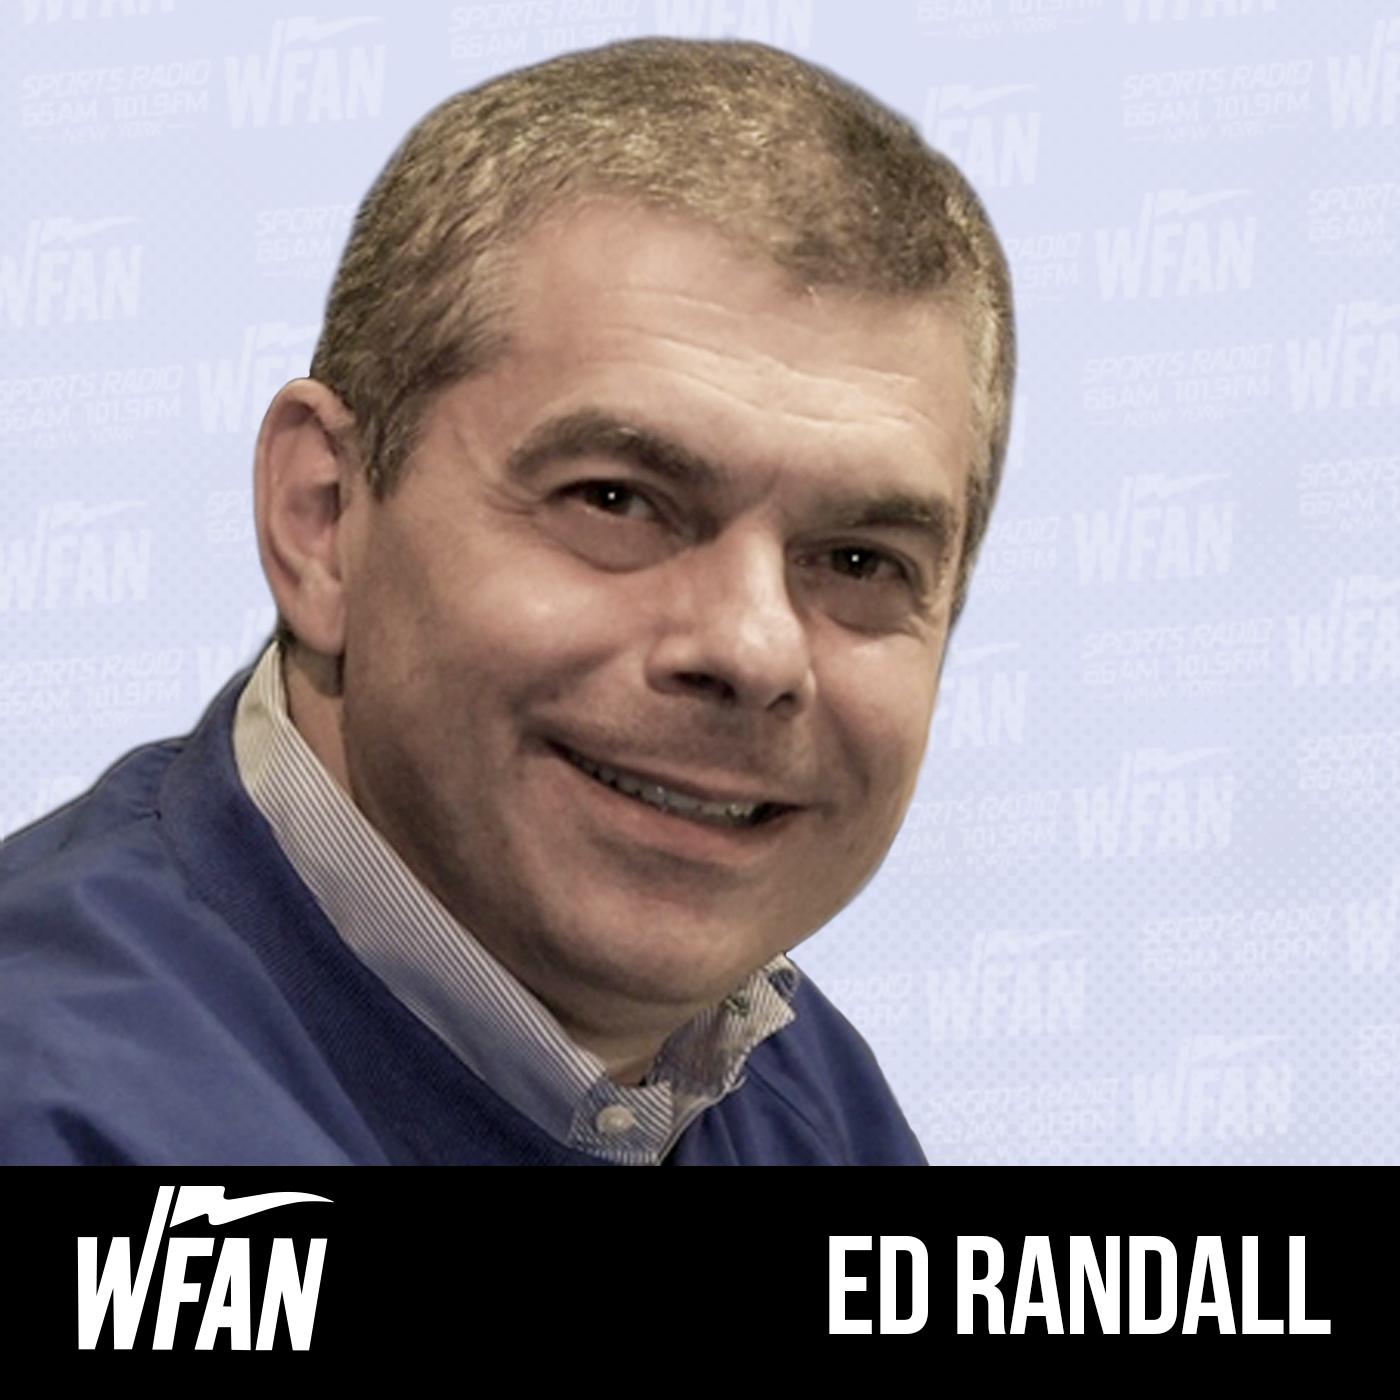 Ed Randall